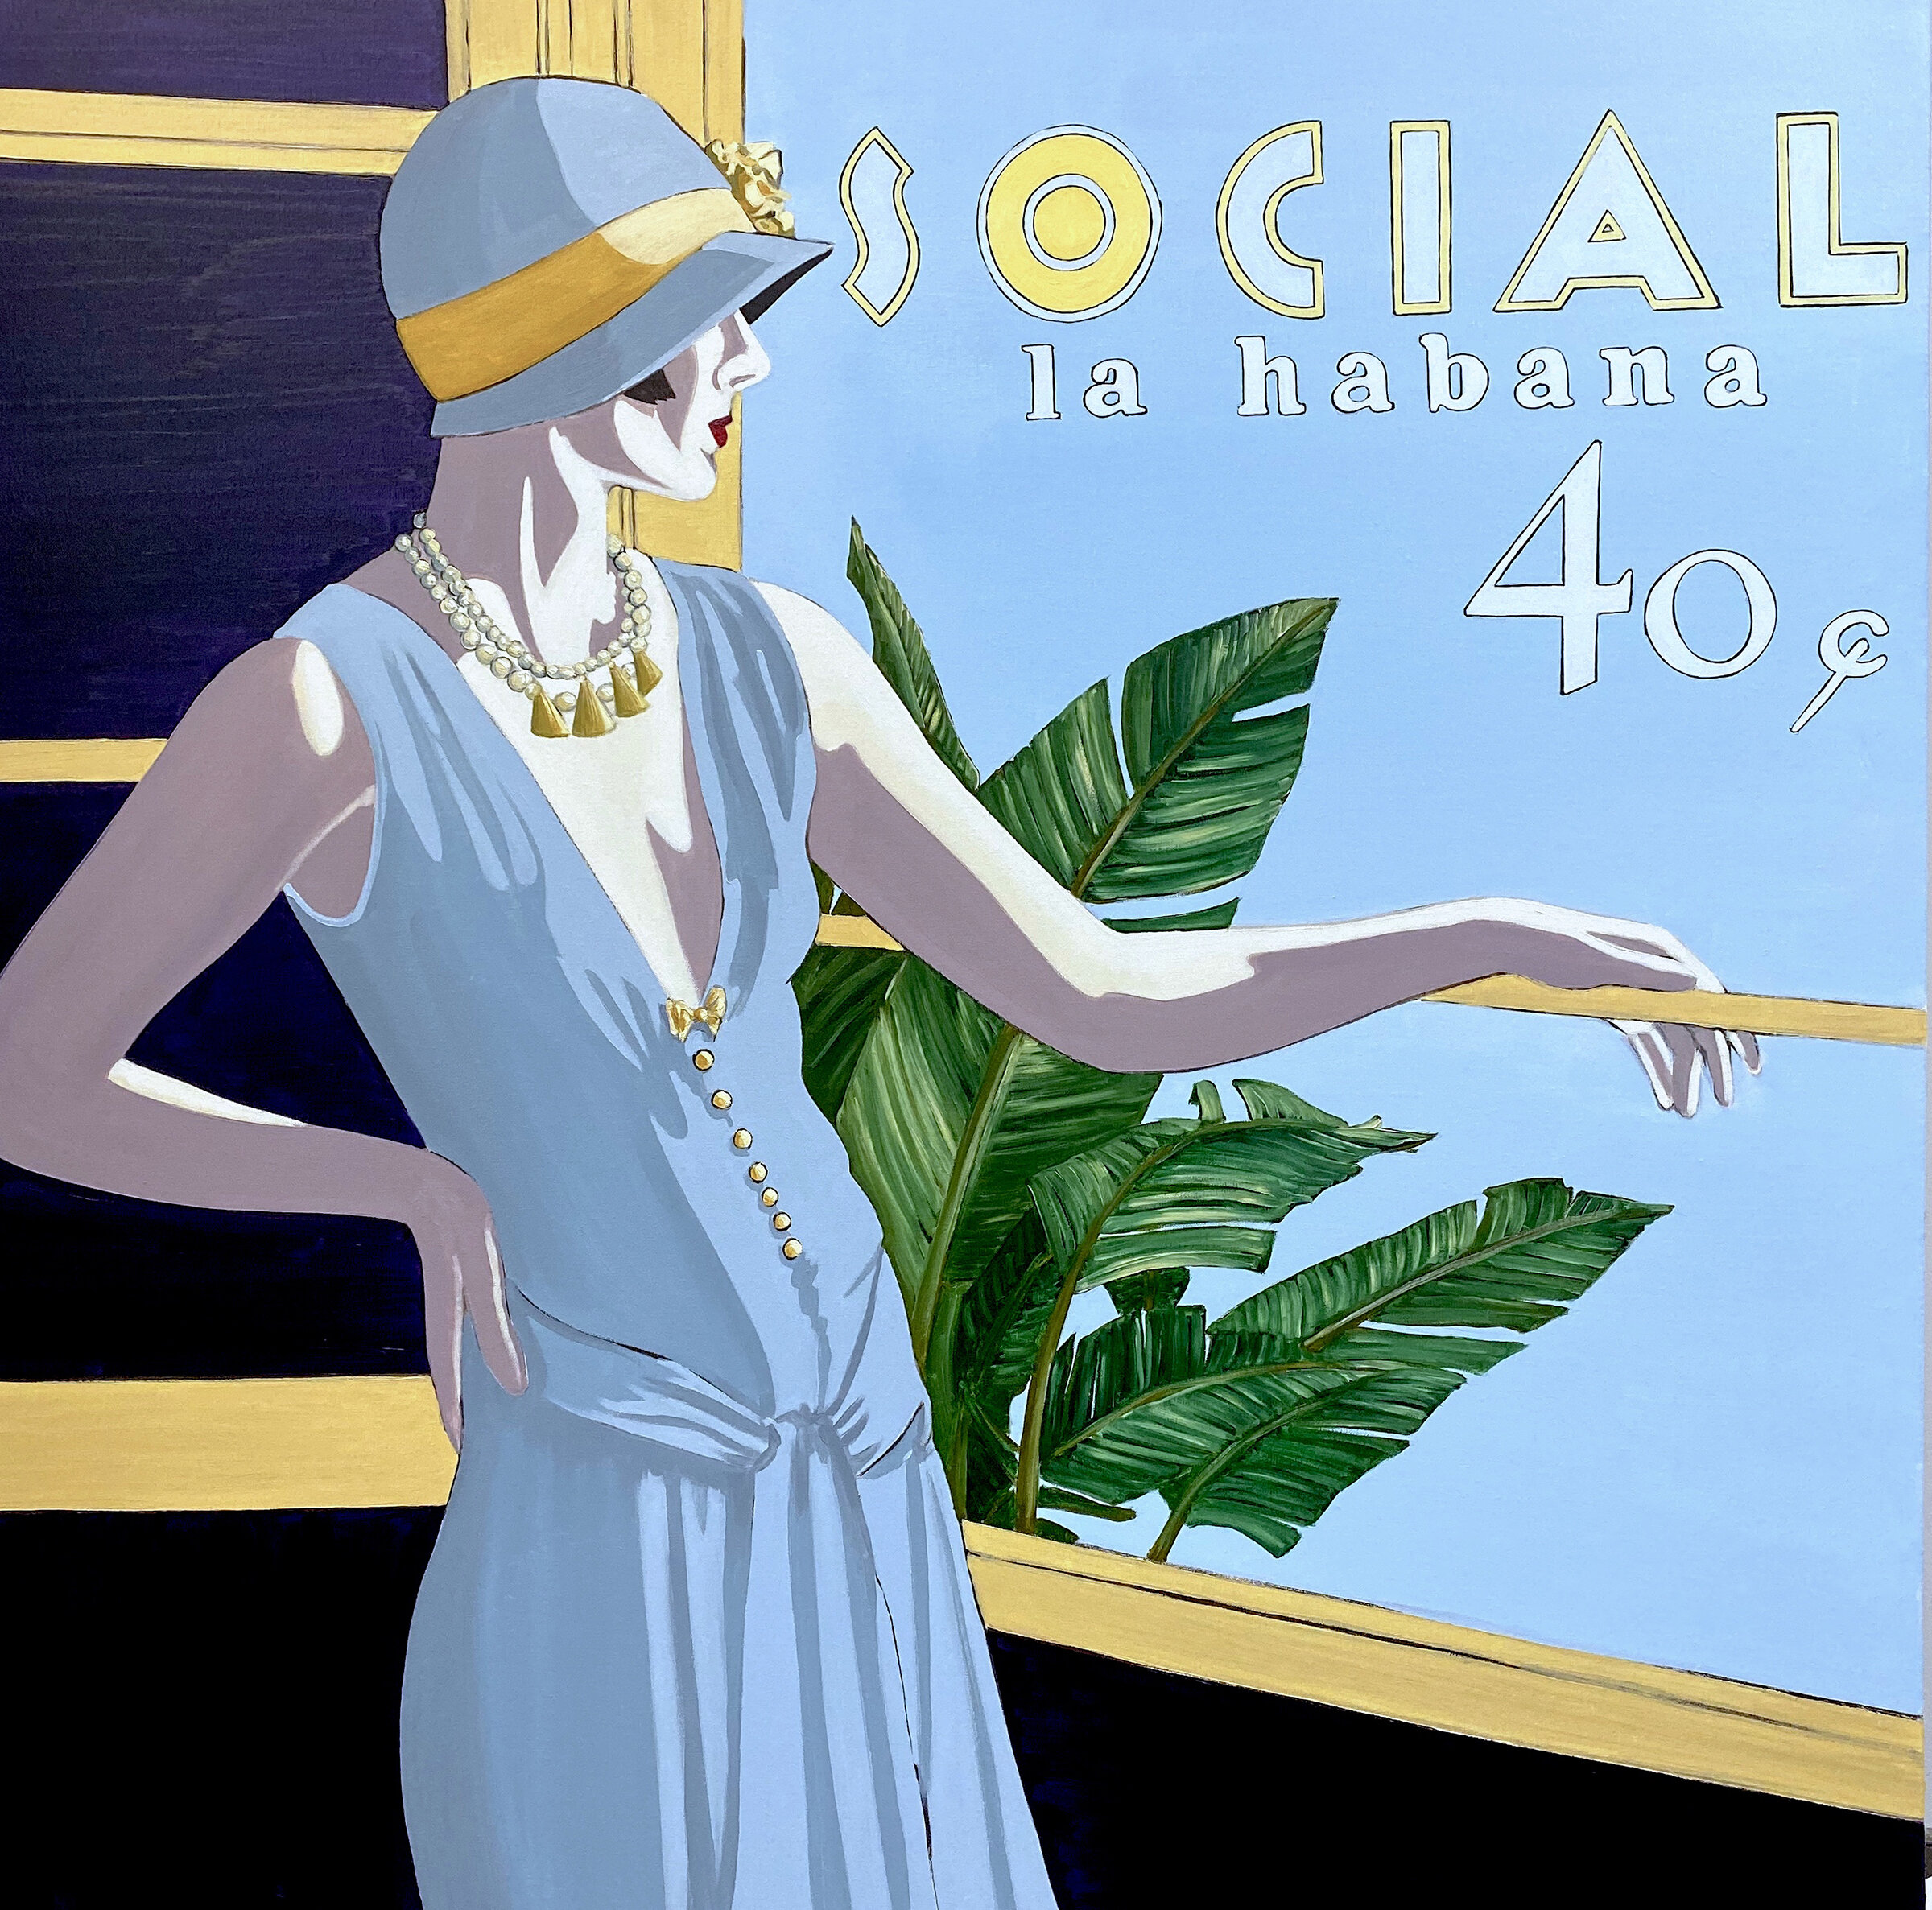 SOCIAL : Grafica